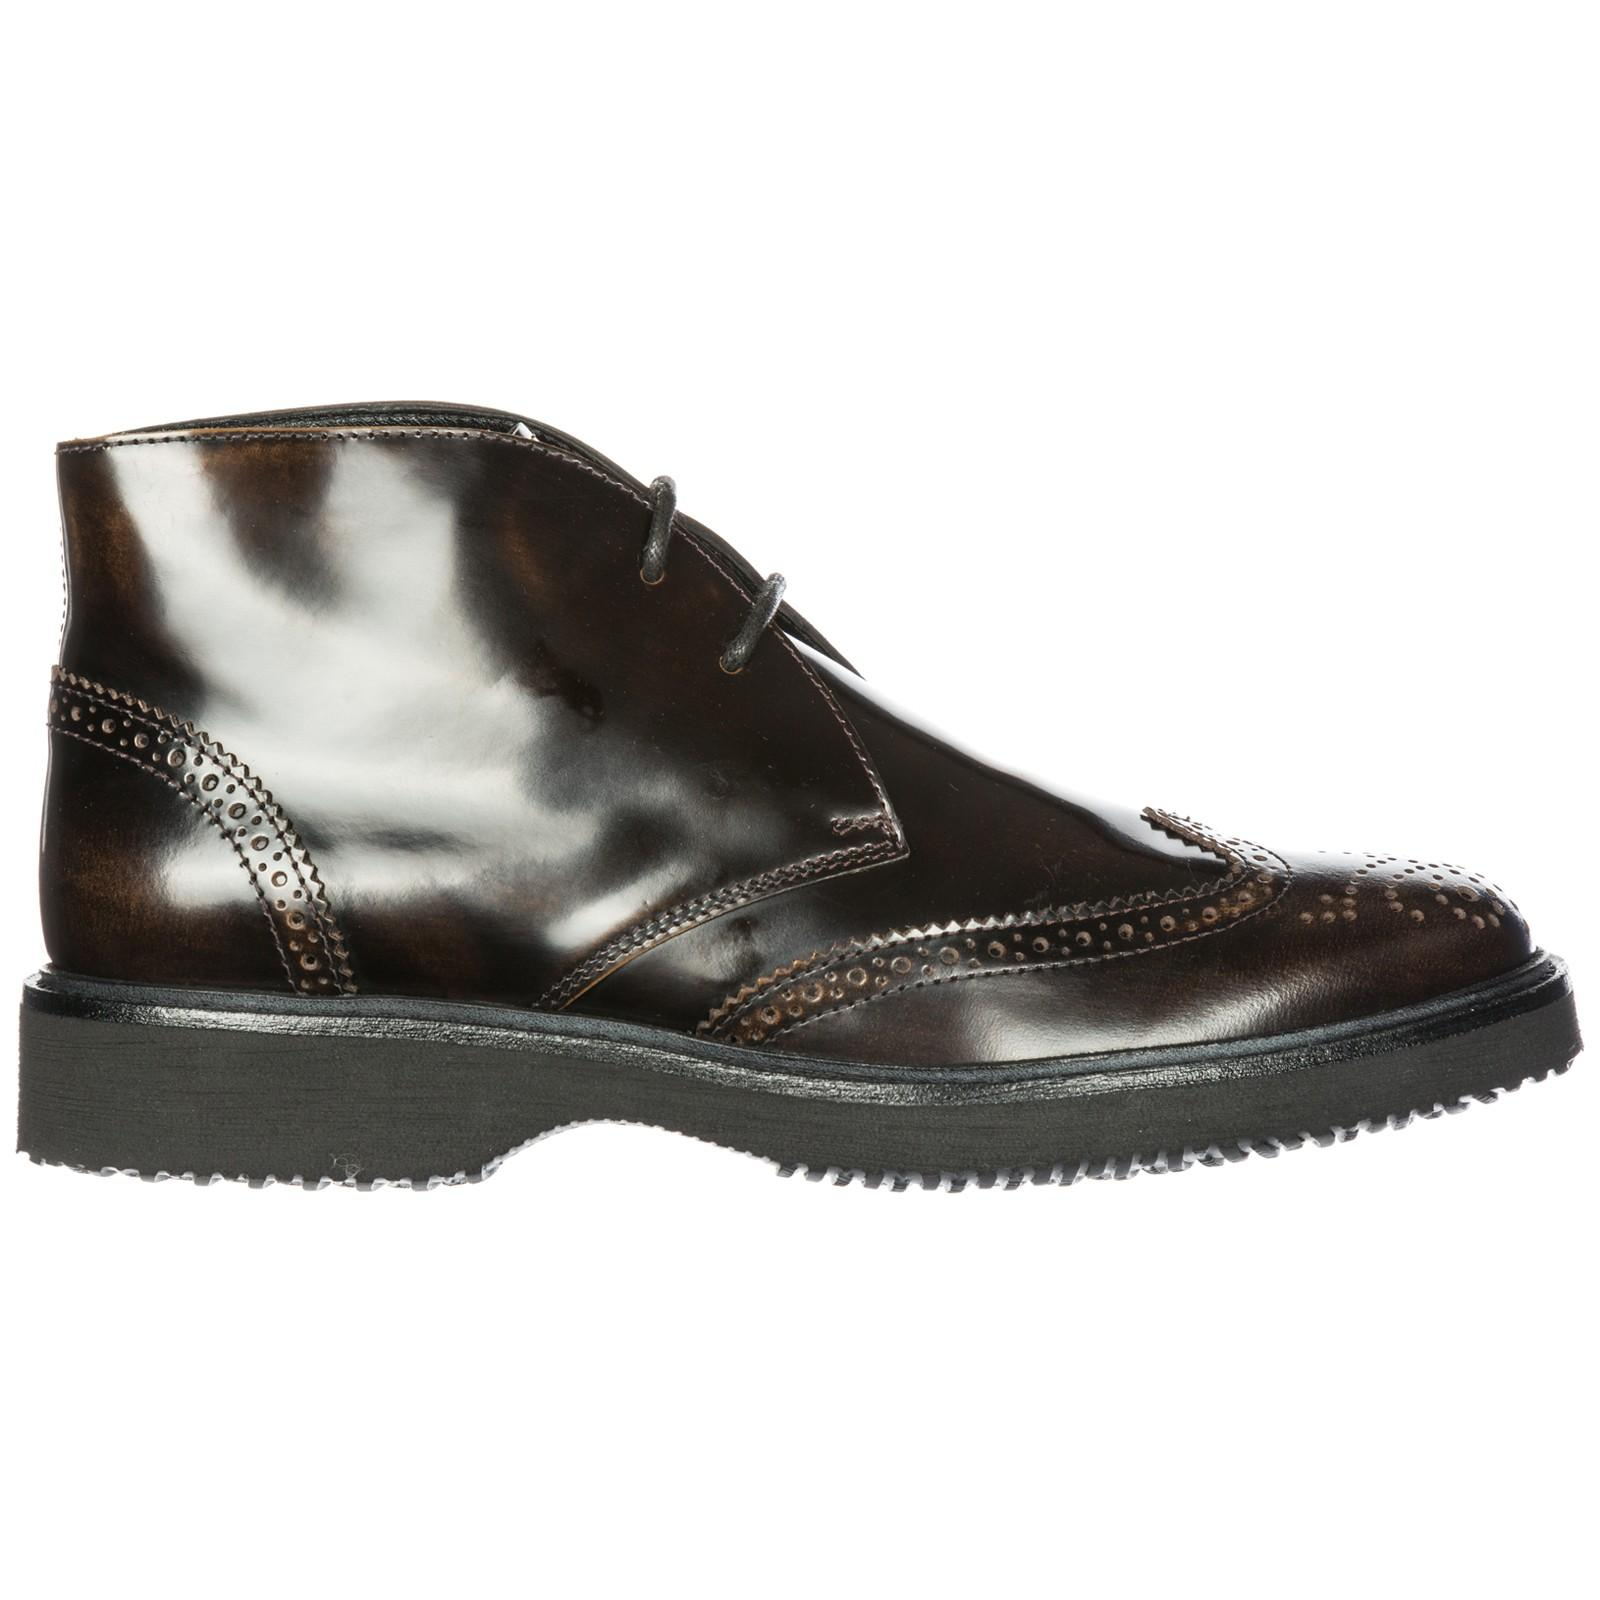 Hogan Men's Leather Desert Boots Lace Up Ankle Boots H217 Route ...